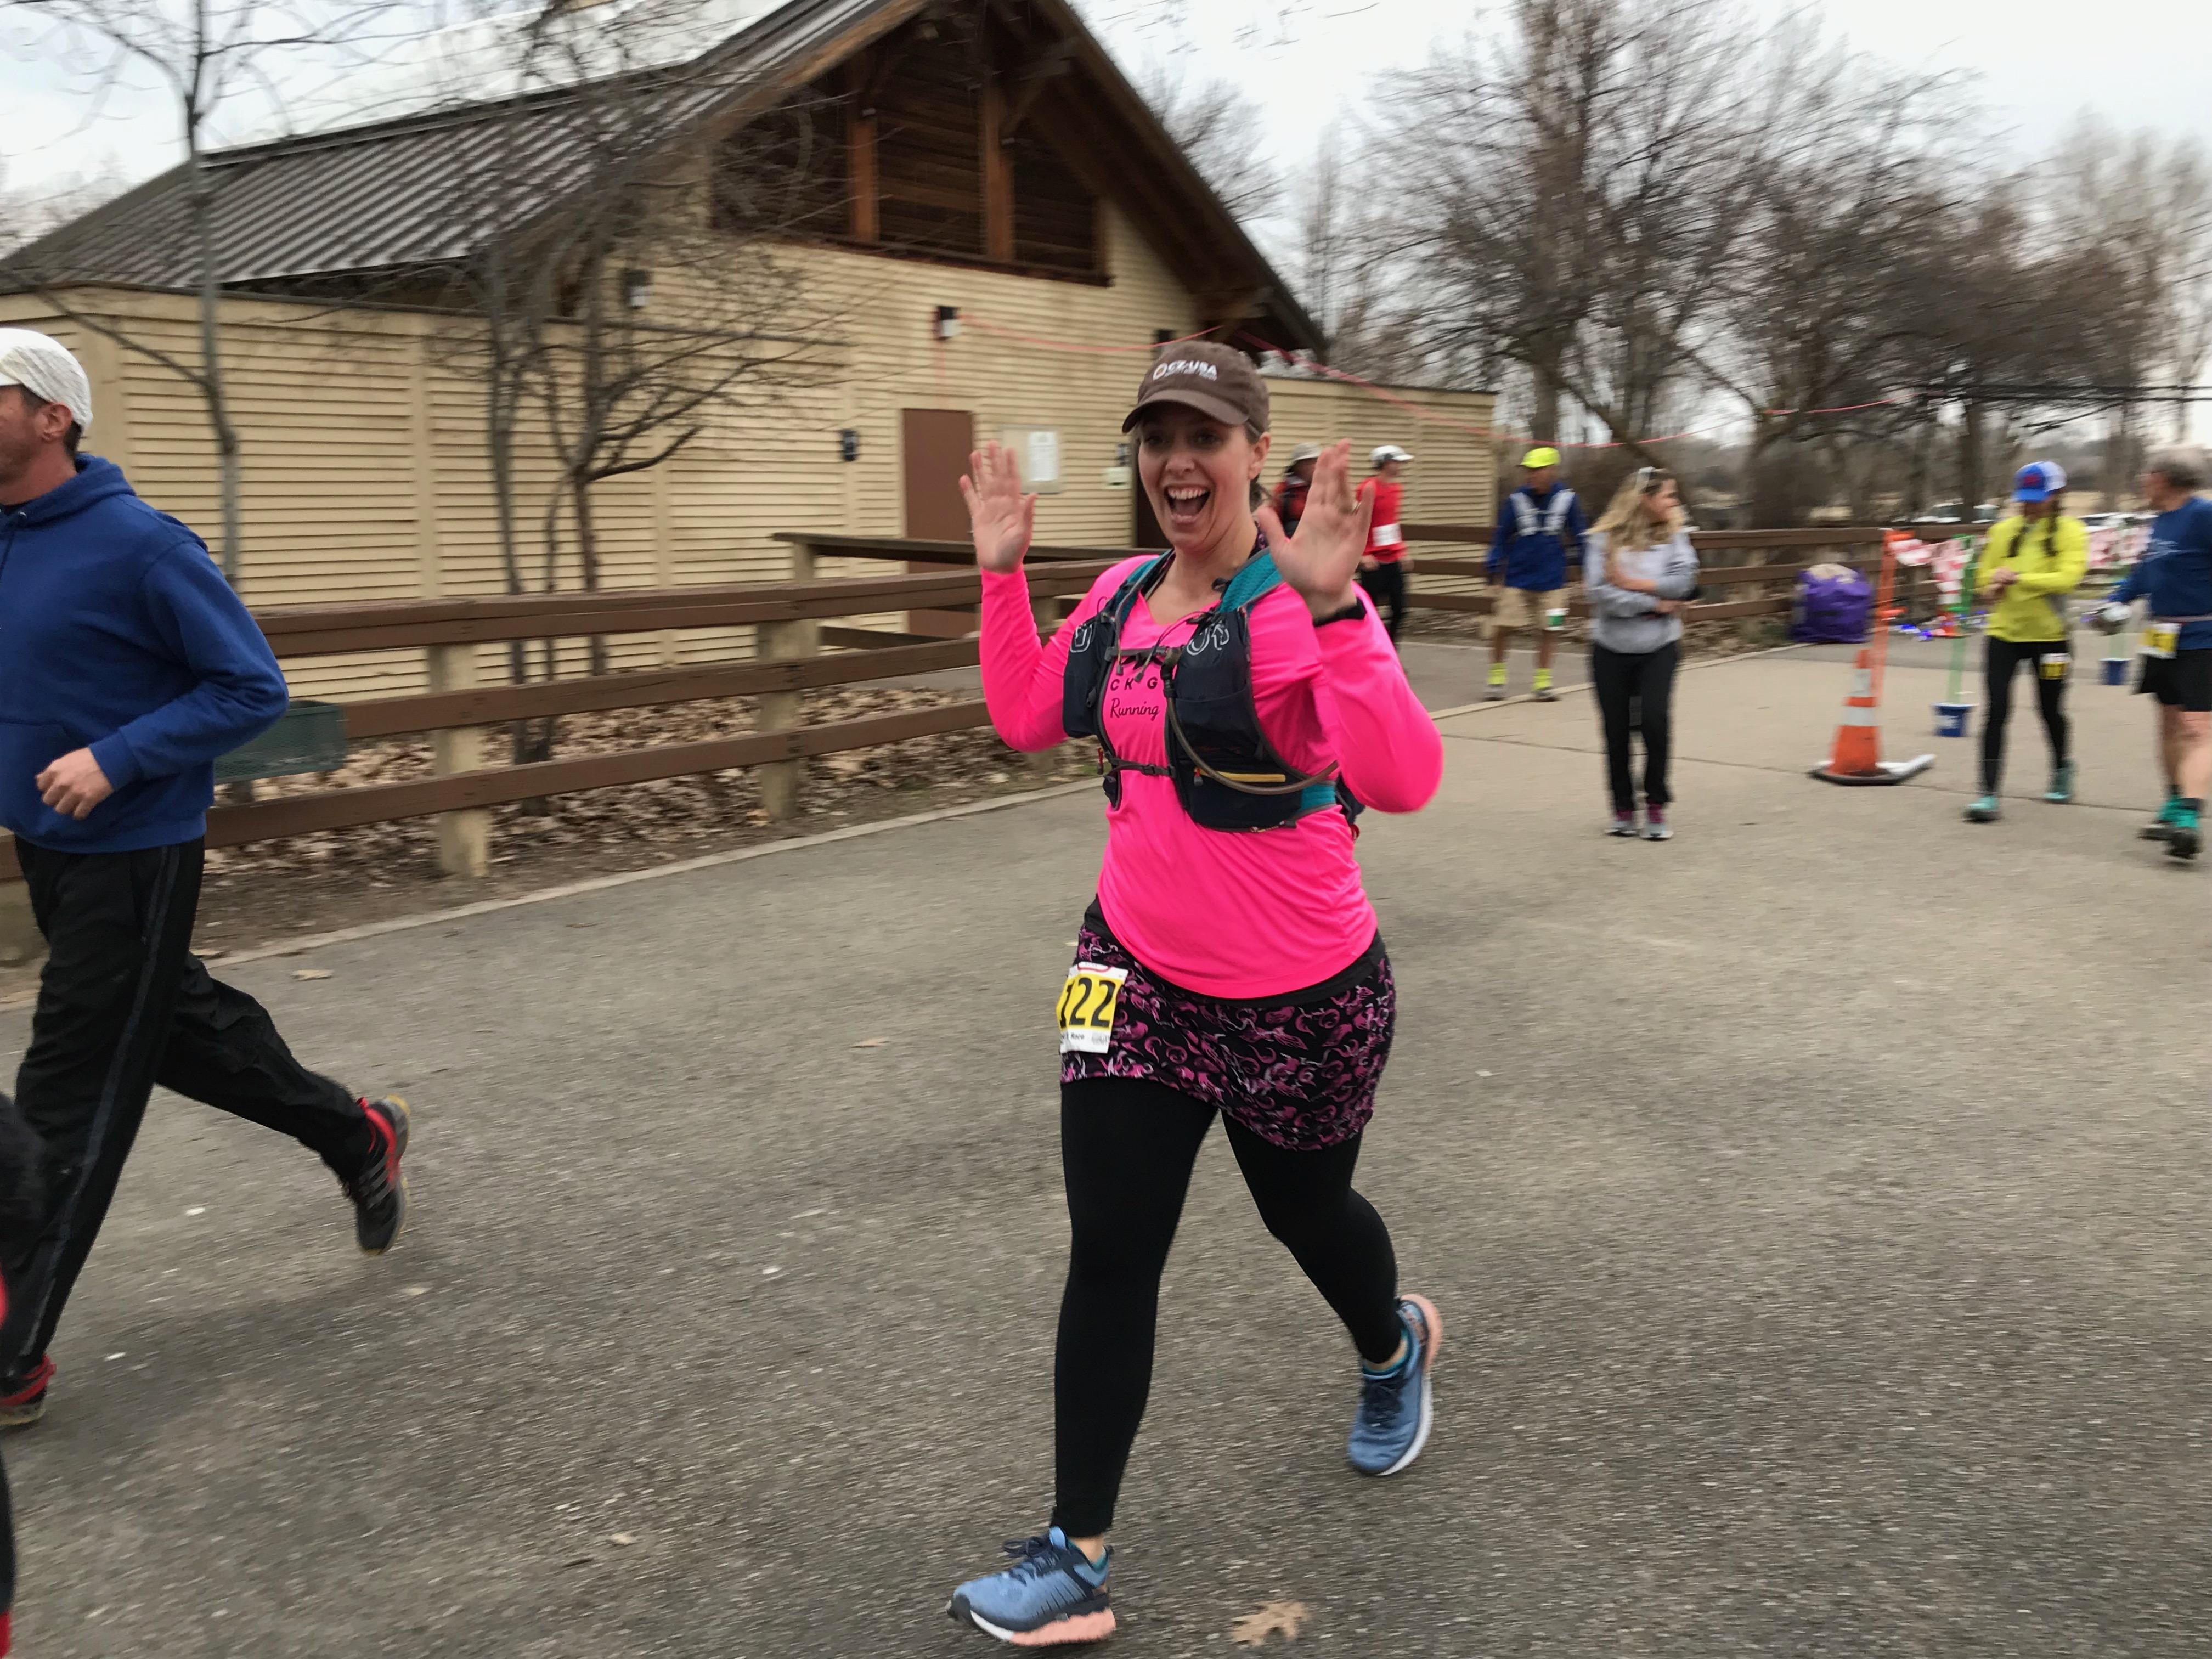 Kristine Goodman runs 52.58 miles in her 24 hour race at the Pulse Endurance Runs!